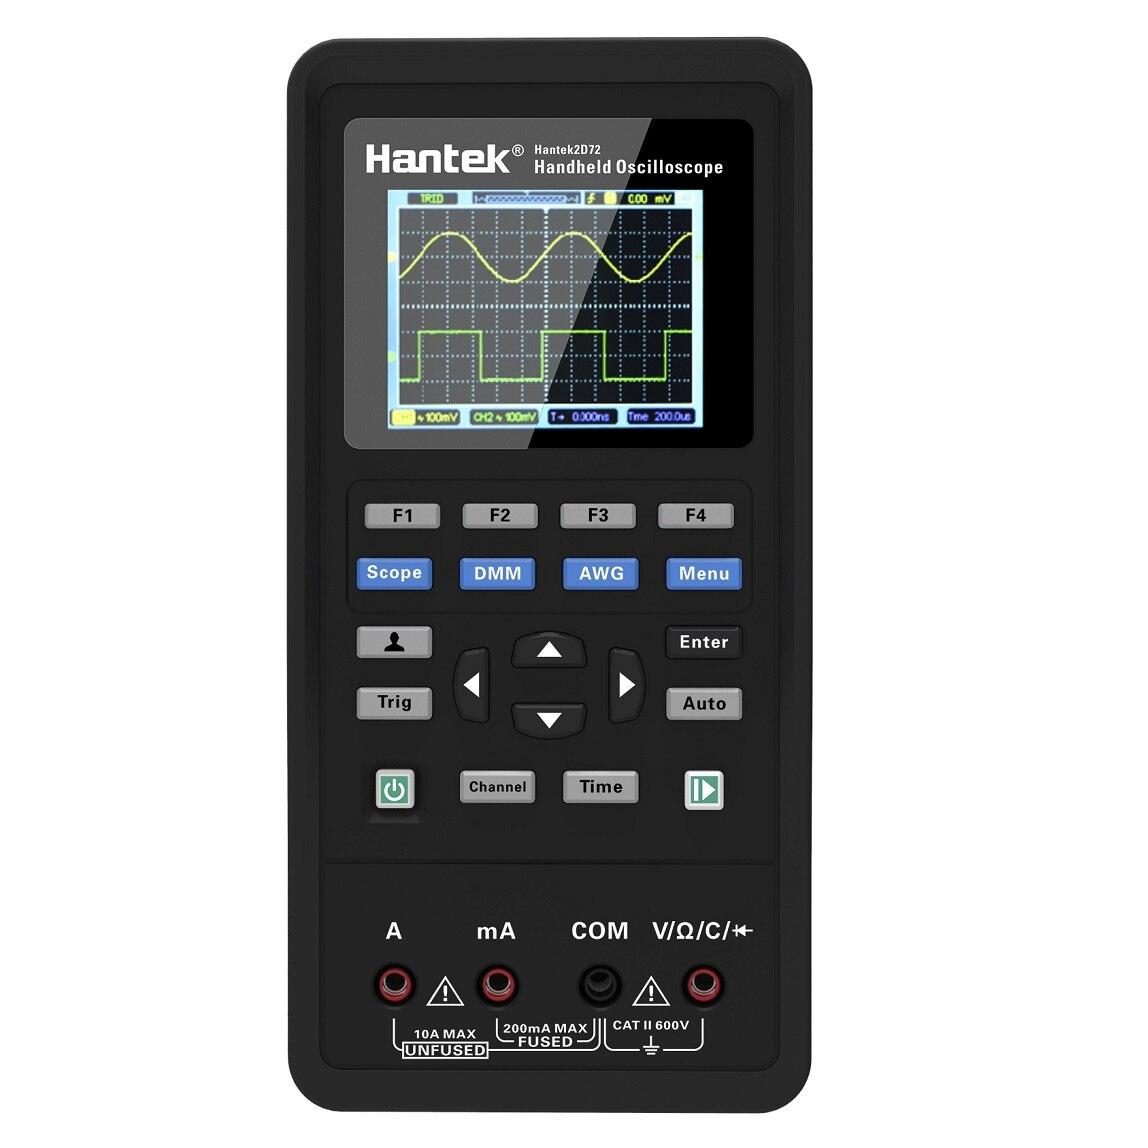 Hantek 3in1 Digital Oscilloscope+Waveform Generator+Multimeter Portable USB 2 Channels 40mhz 70mhz LCD Display Test Meter Tools